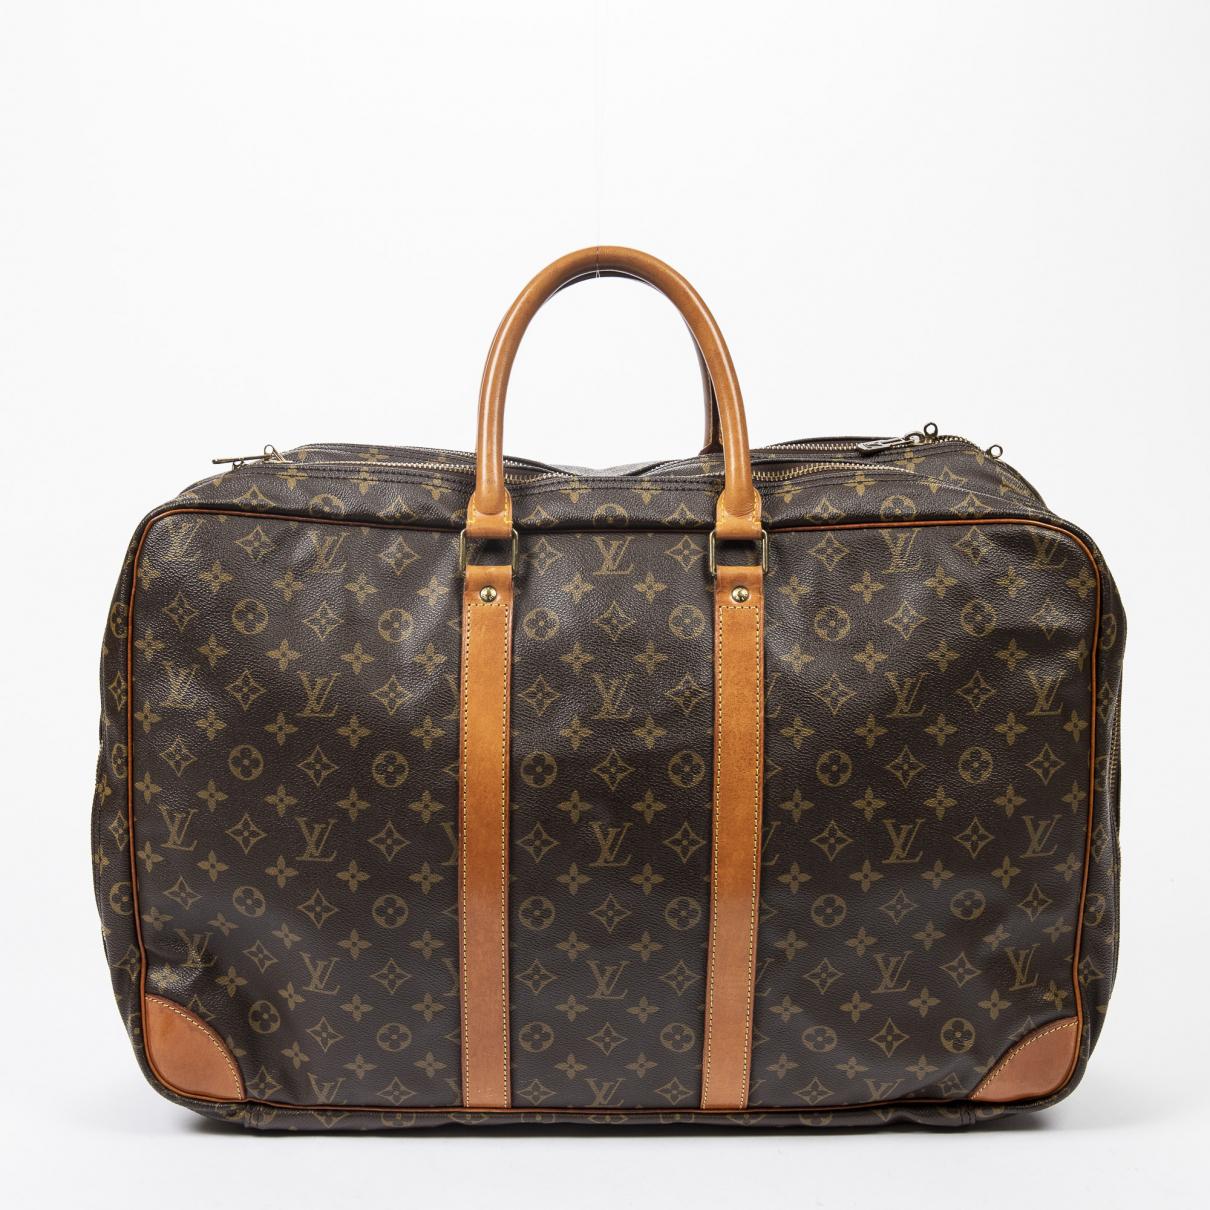 Bolso de viaje Sirius Louis Vuitton